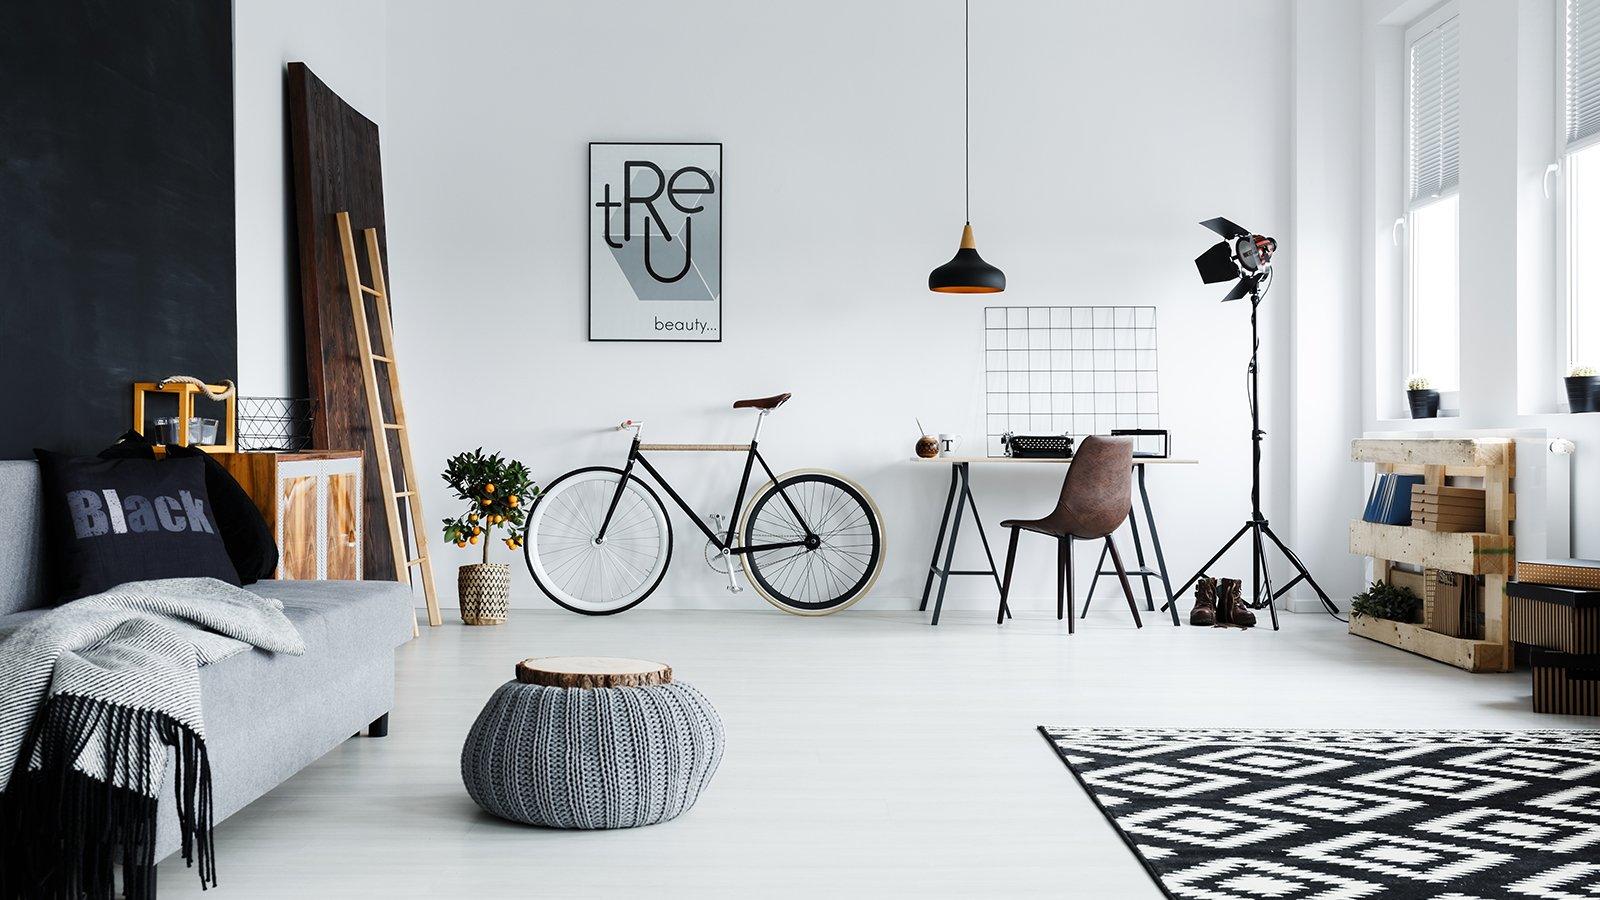 Modern spacious studio apartment with sofa, bike and desk